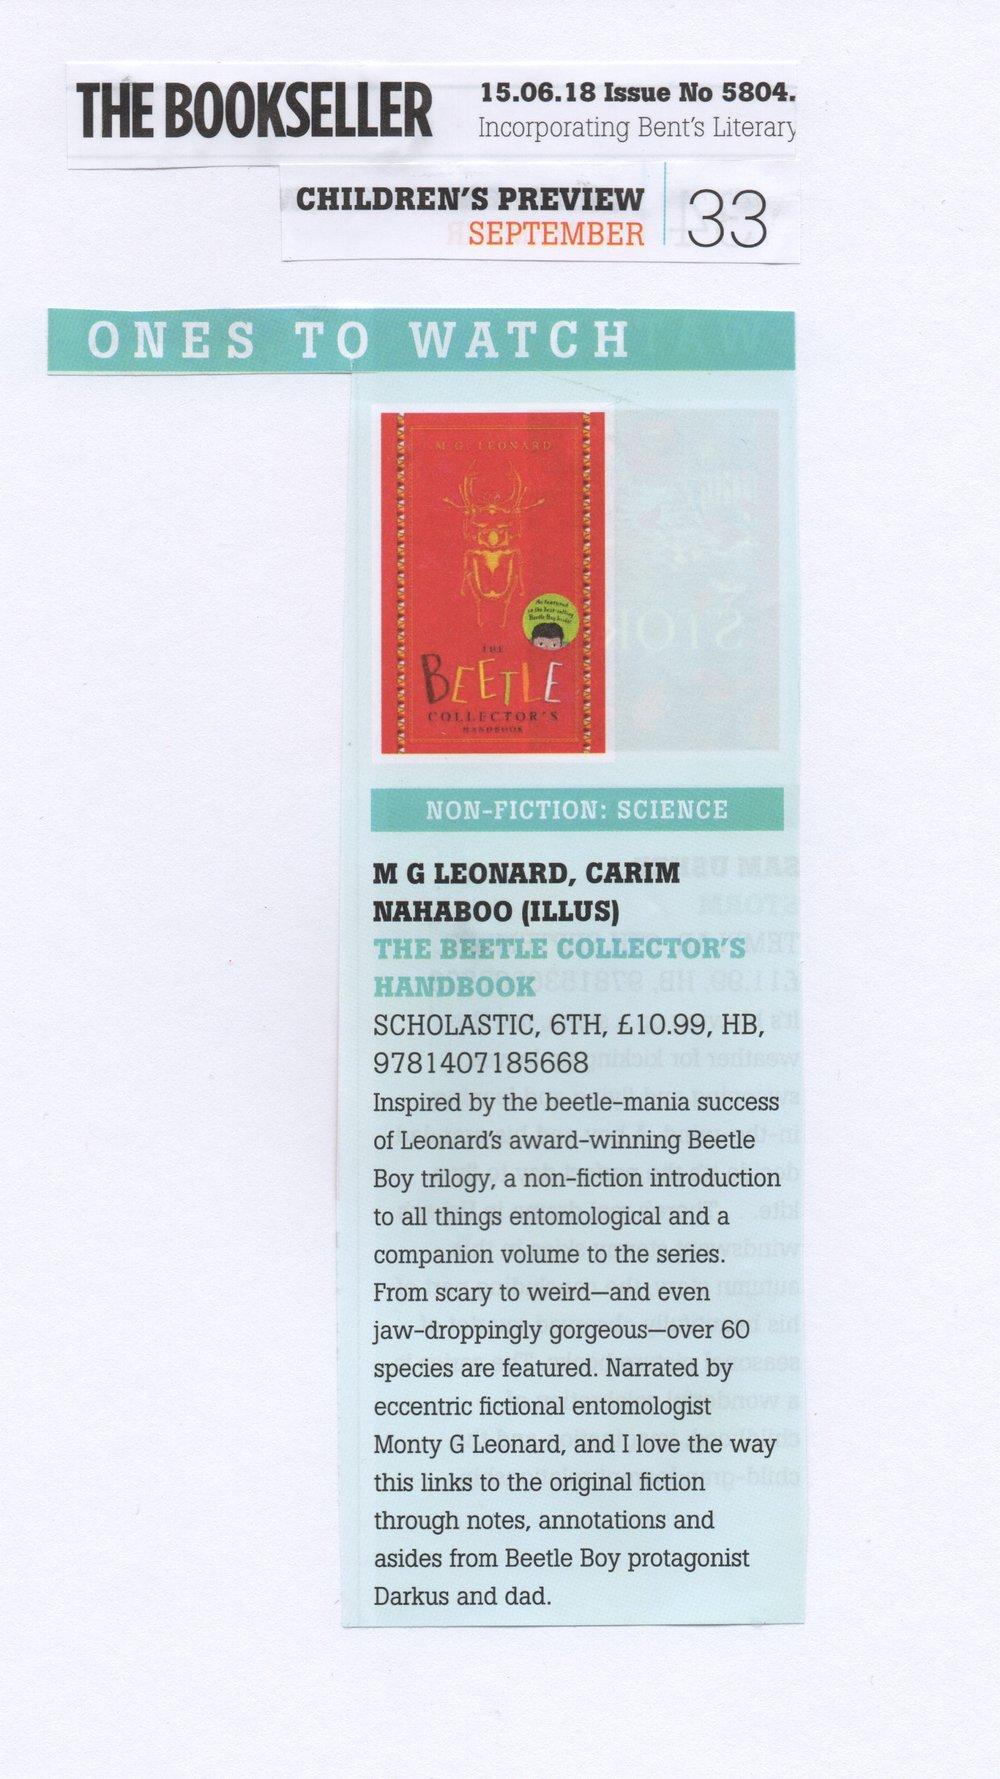 BeetleCollectorHandbookBooksellerJune2018.jpeg